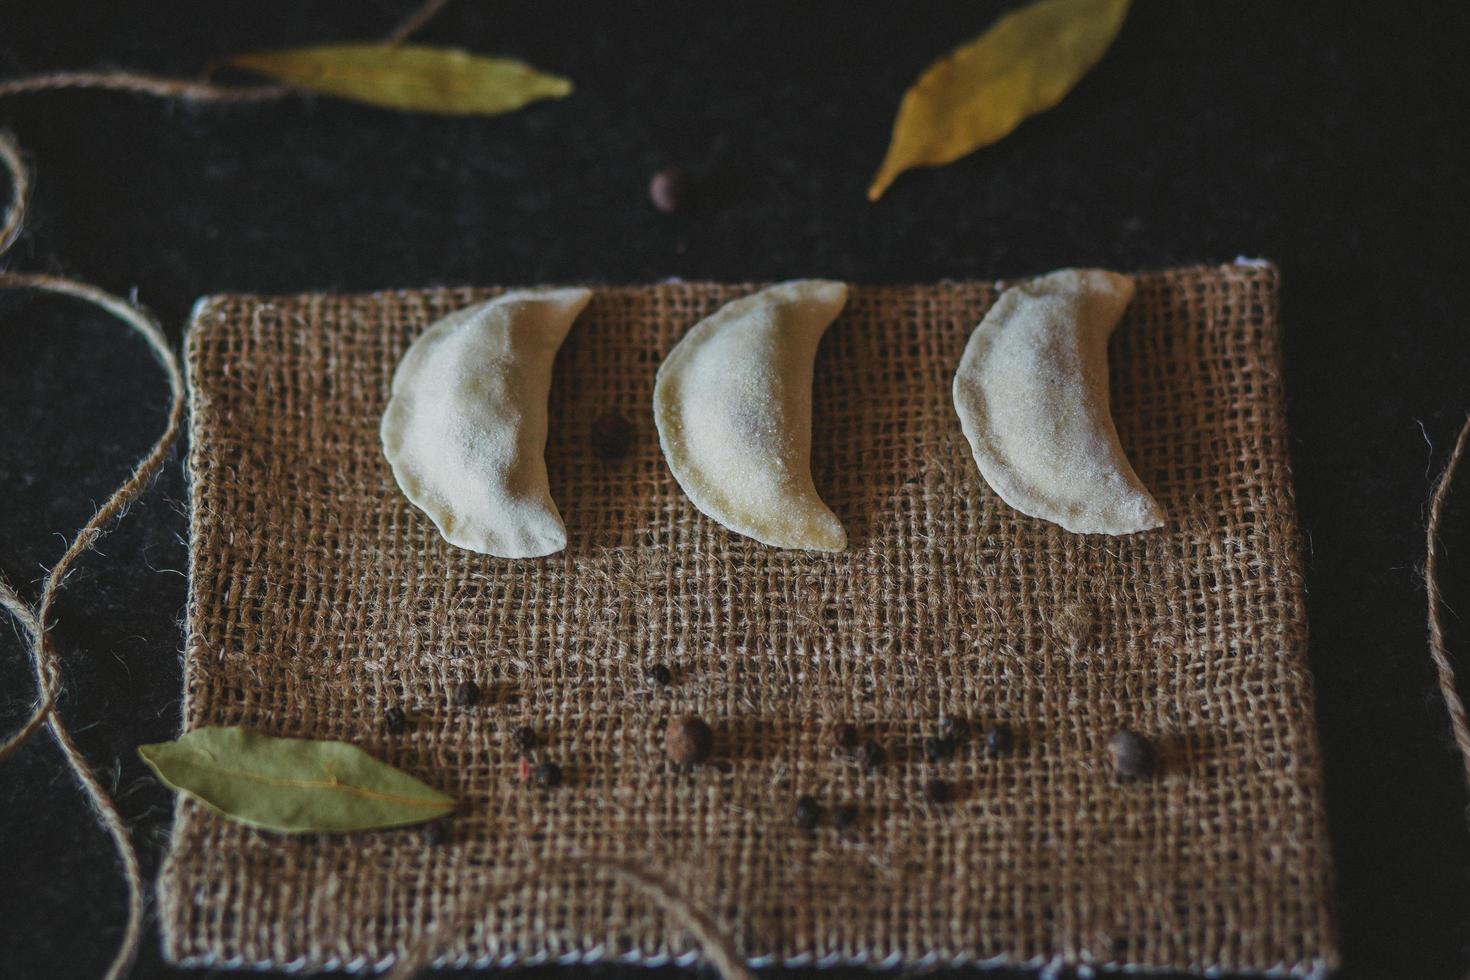 empanadas på tyg foto